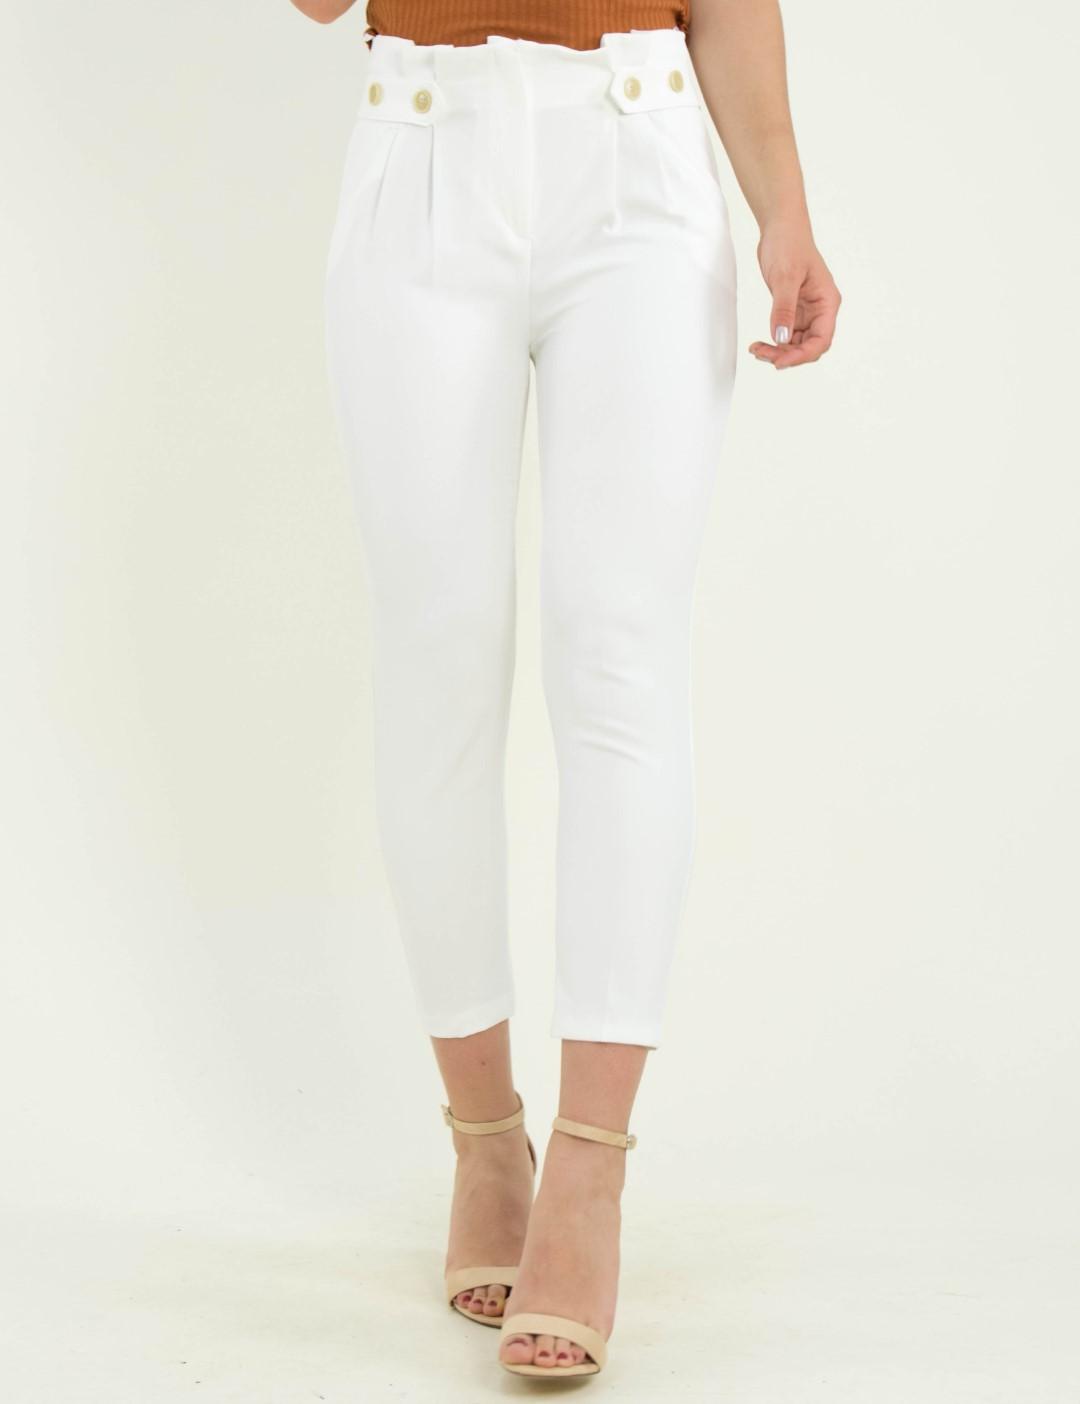 85a97acf3b7 Γυναικείο λευκό ψηλόμεσο υφασμάτινο παντελόνι πιέτες 205205D